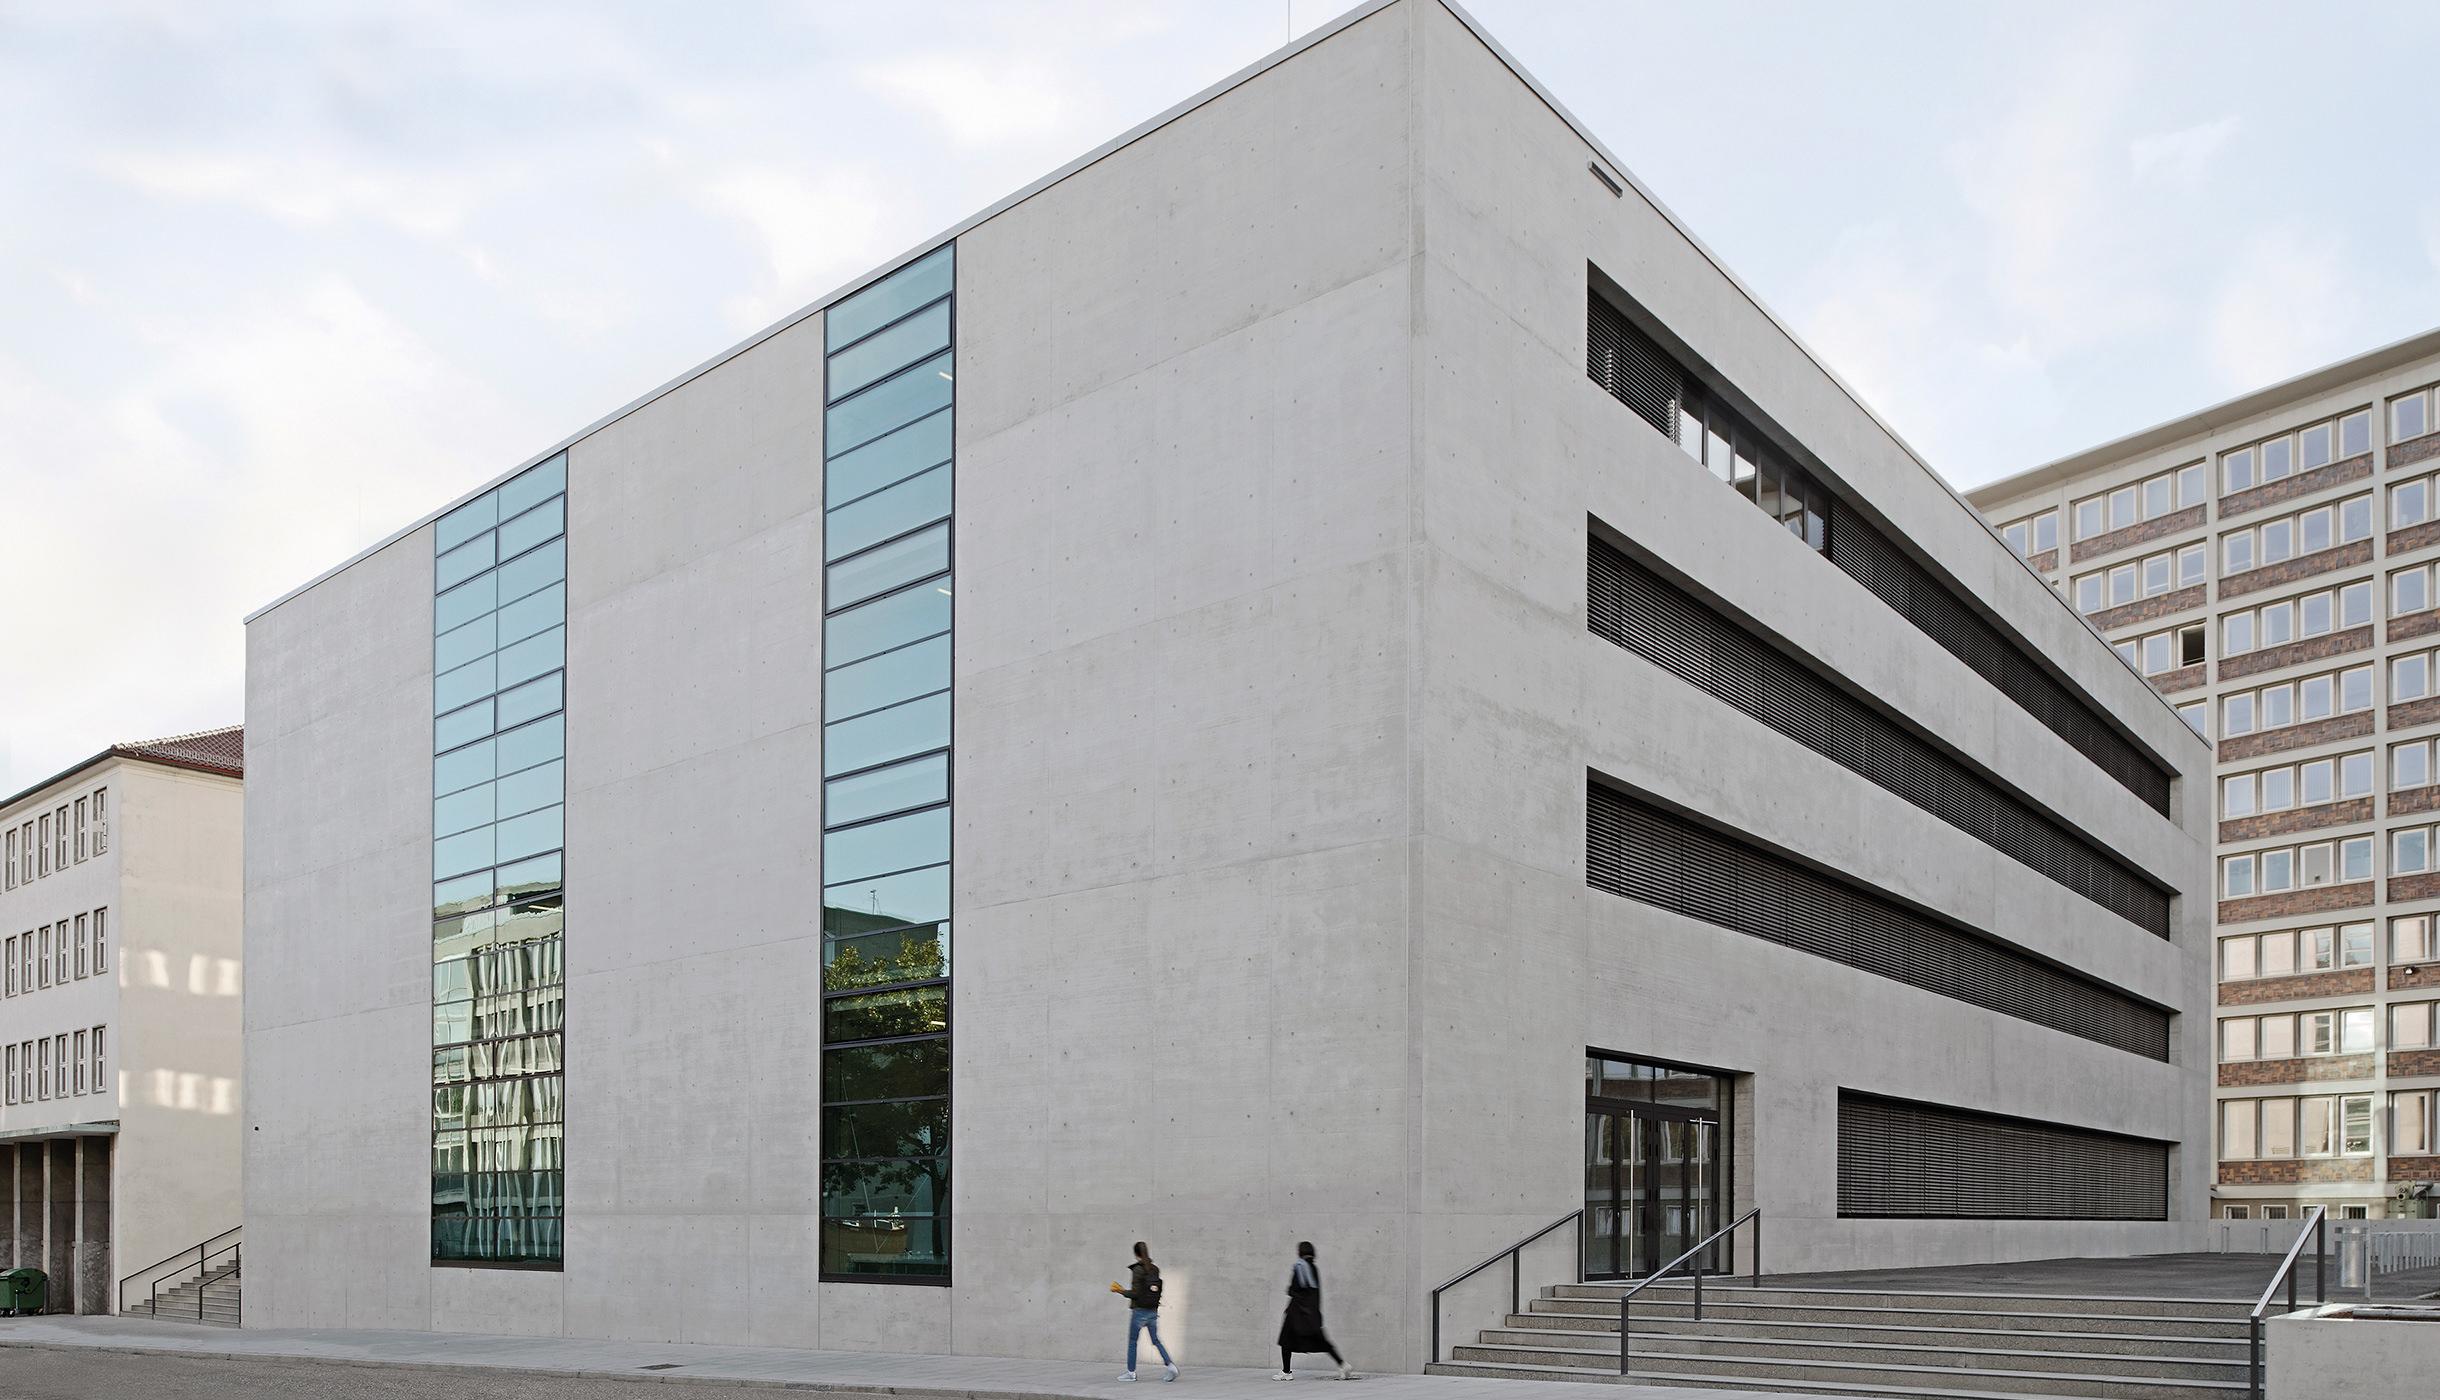 Hft stuttgart niels schubert fotograf bff for Fh stuttgart architektur